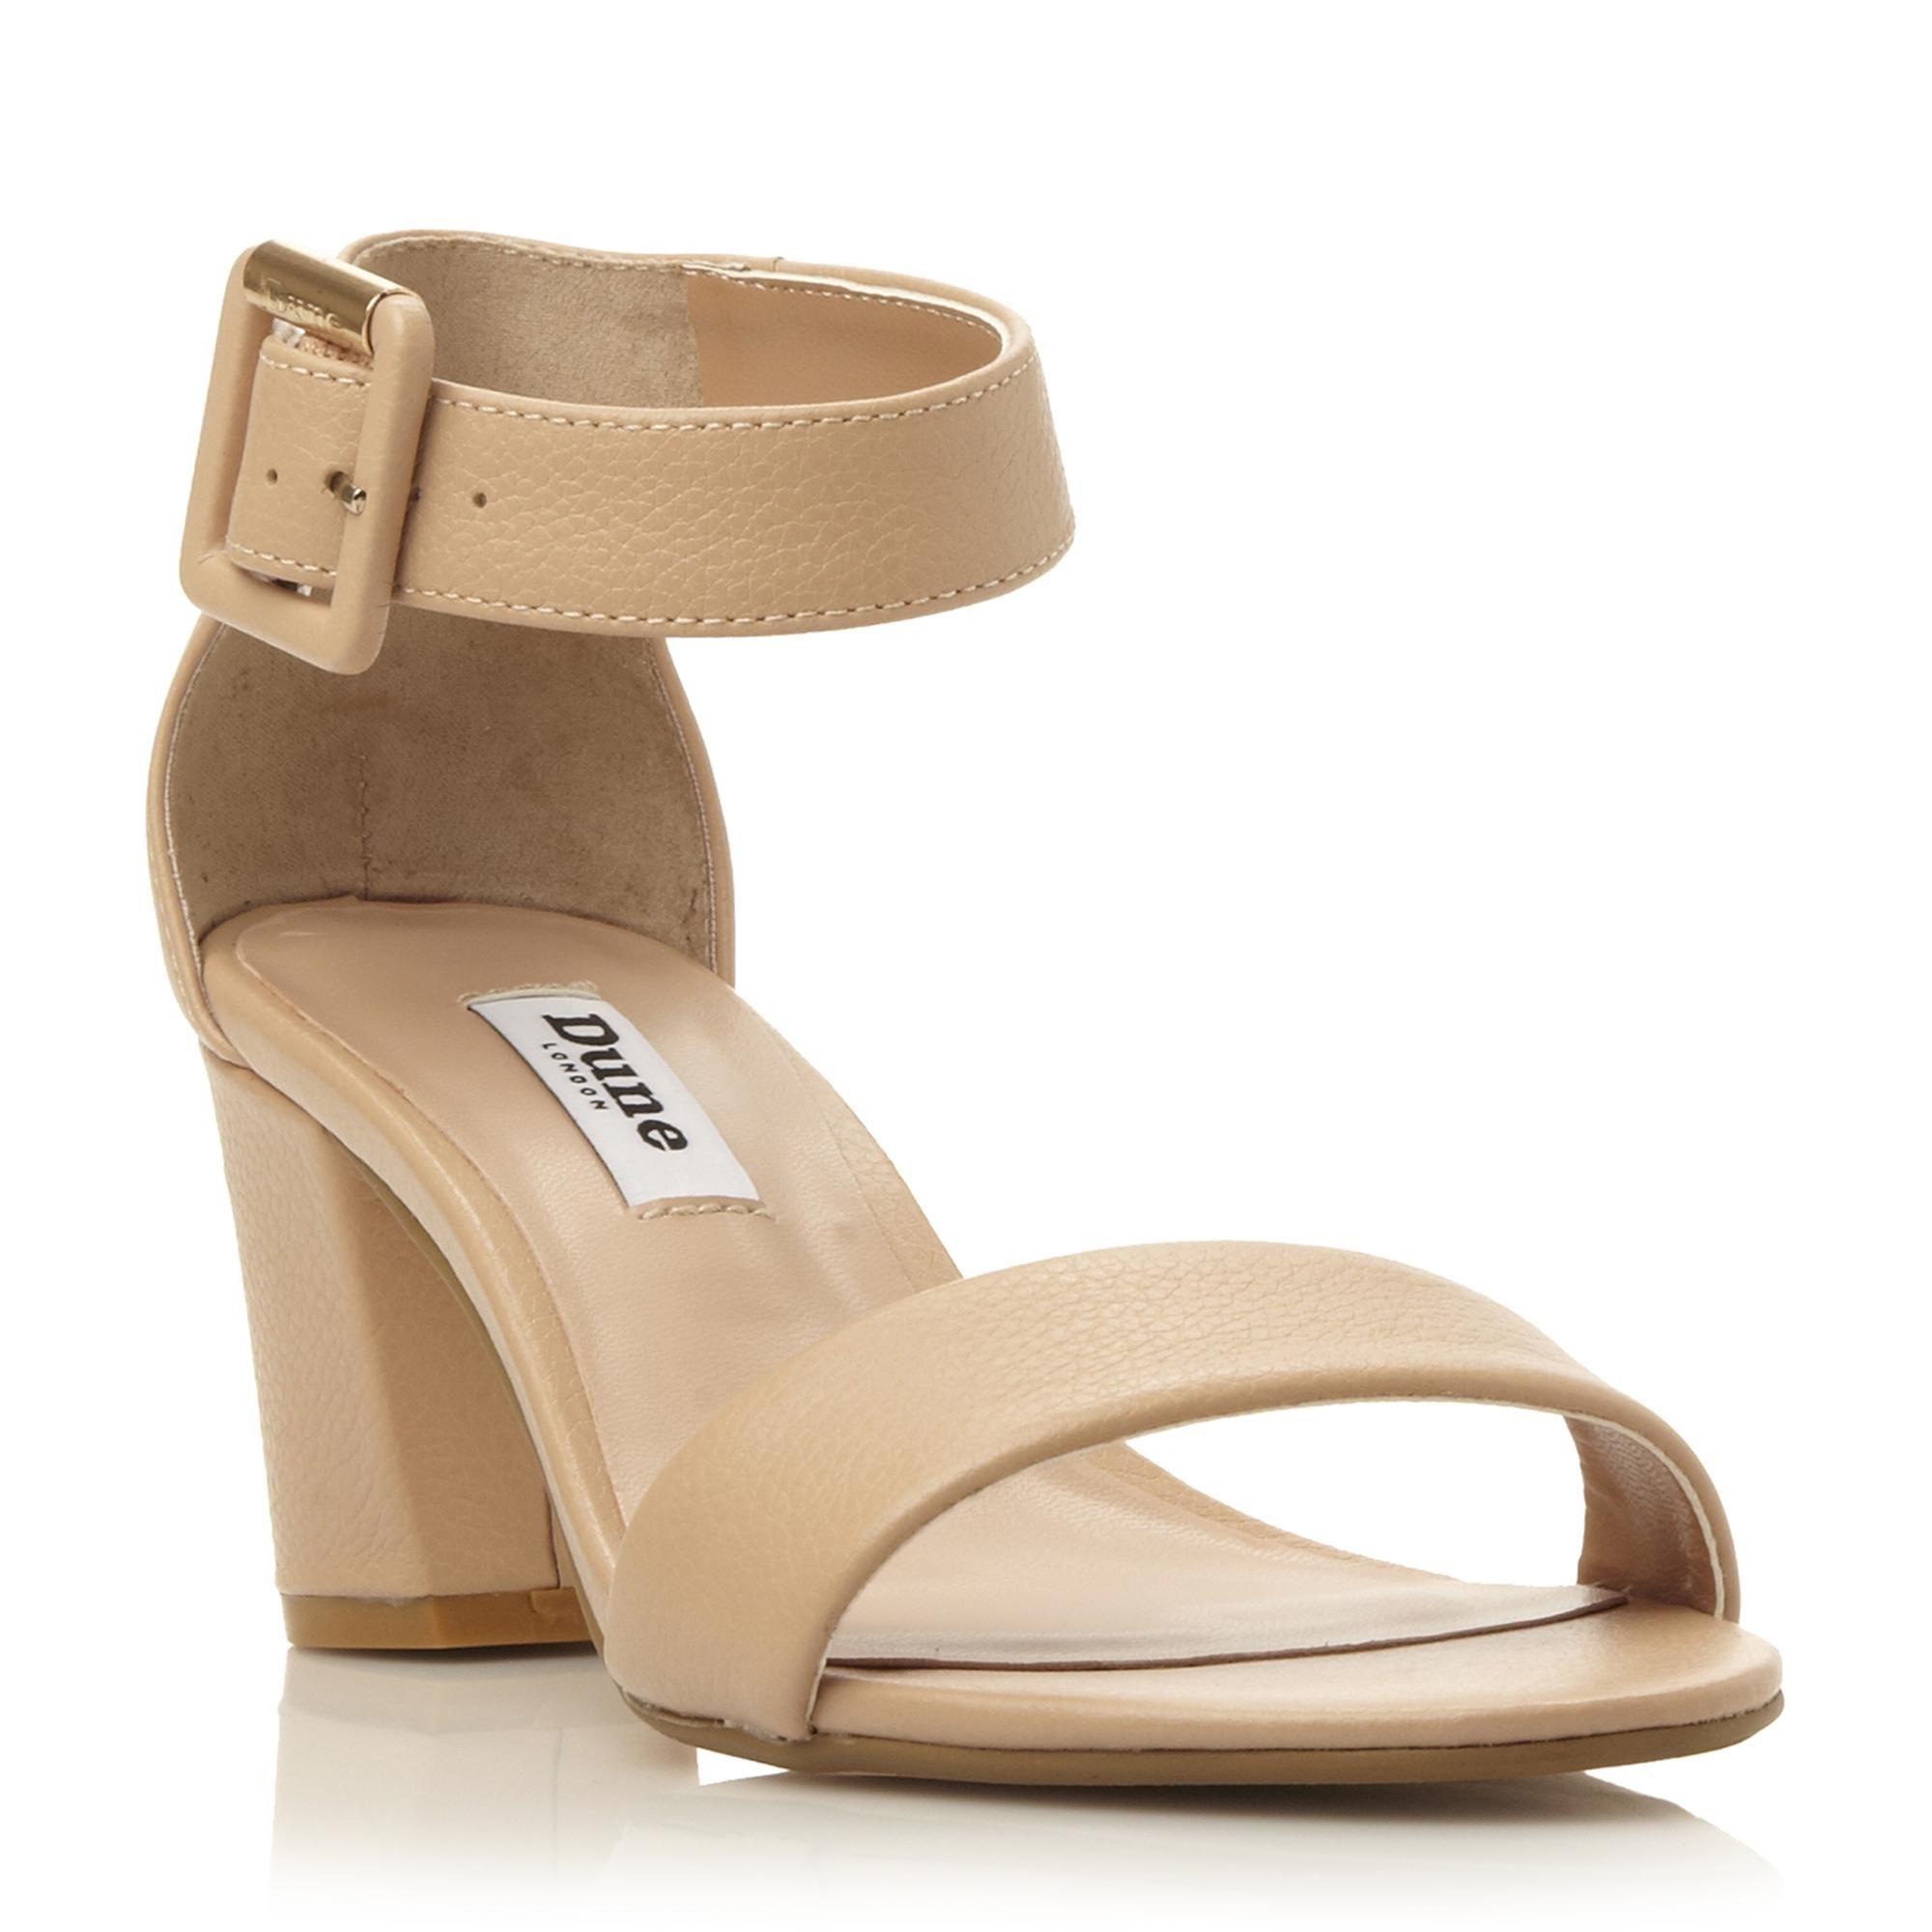 DUNE LADIES JOYE - Two Part Block Heel Sandal - nude | Dune Shoes Online